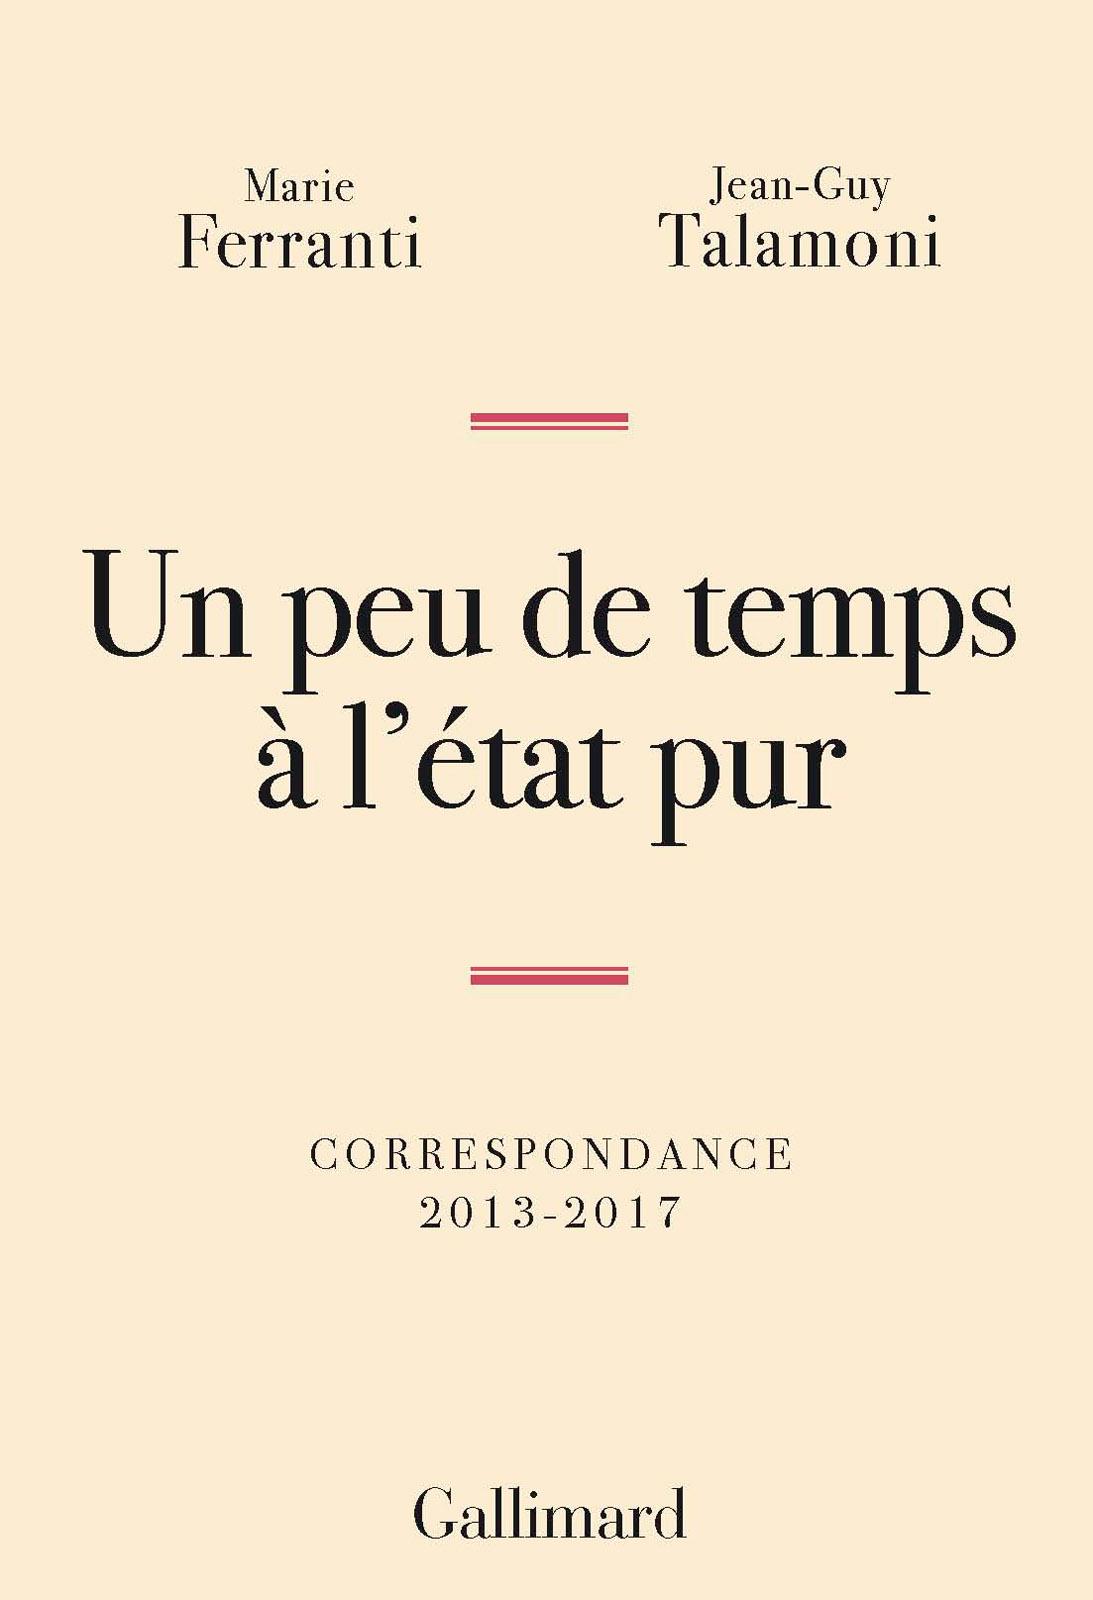 Un peu de temps à l'état pur. Correspondance 2013-2017